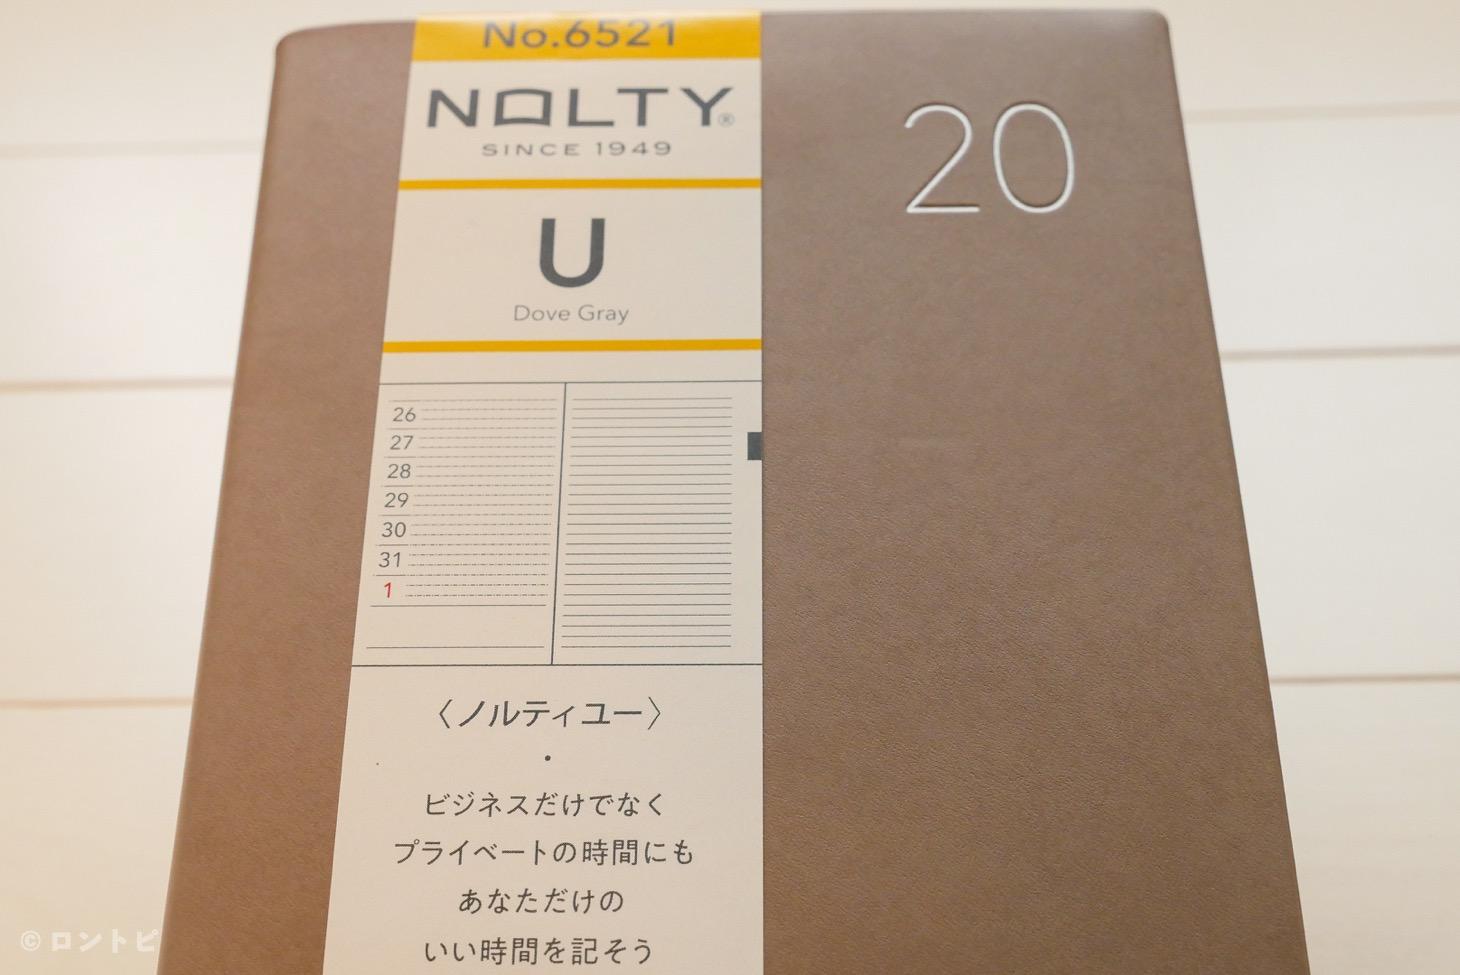 NOLTY U レビュー